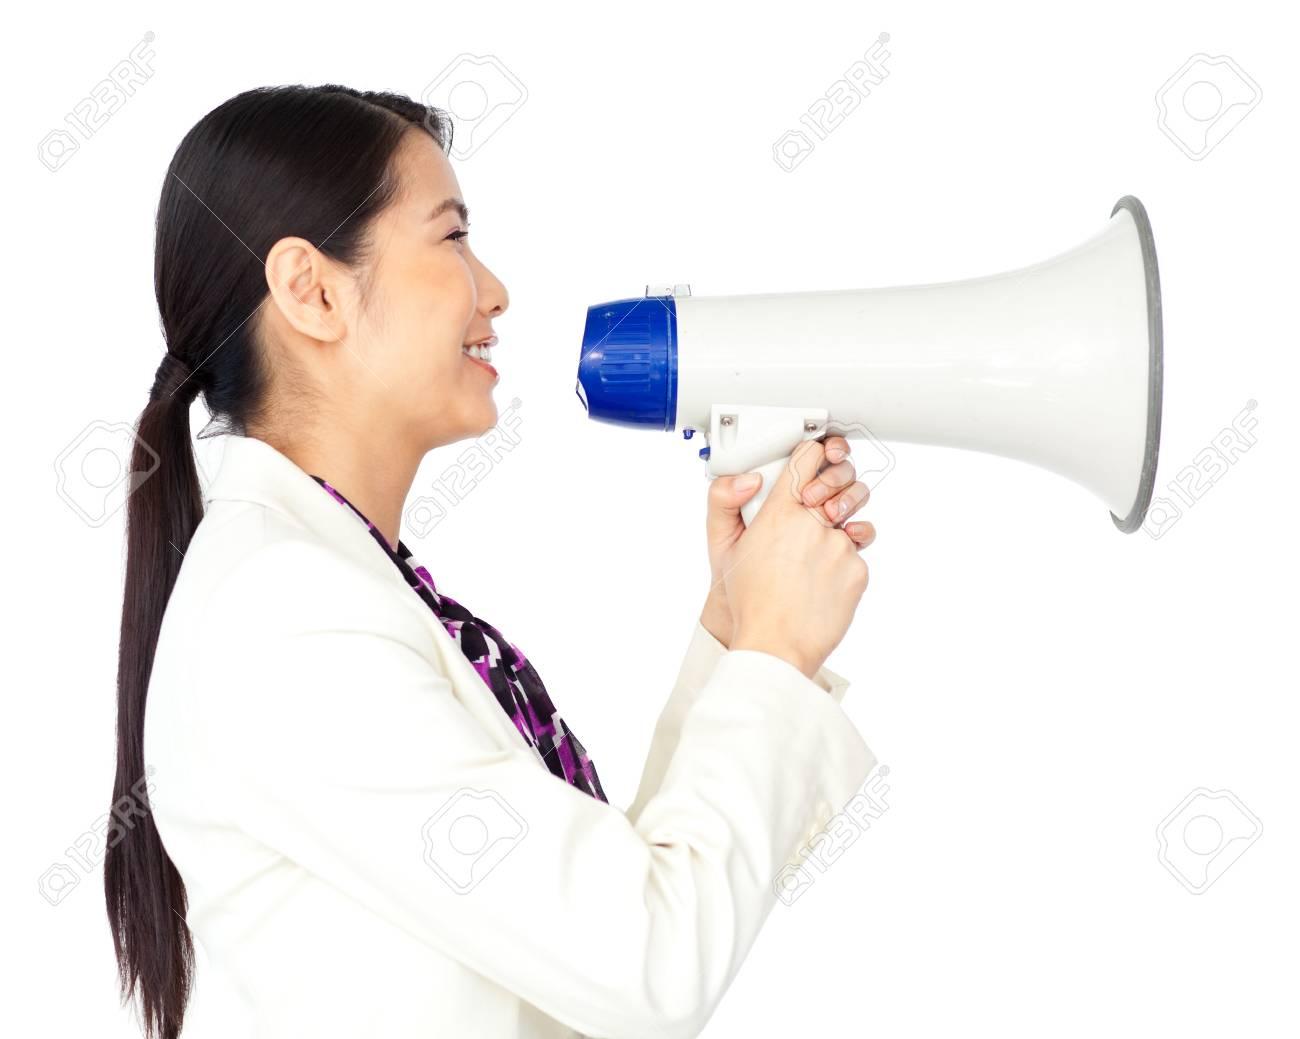 Assretive businesswoman with megaphone Stock Photo - 10090543